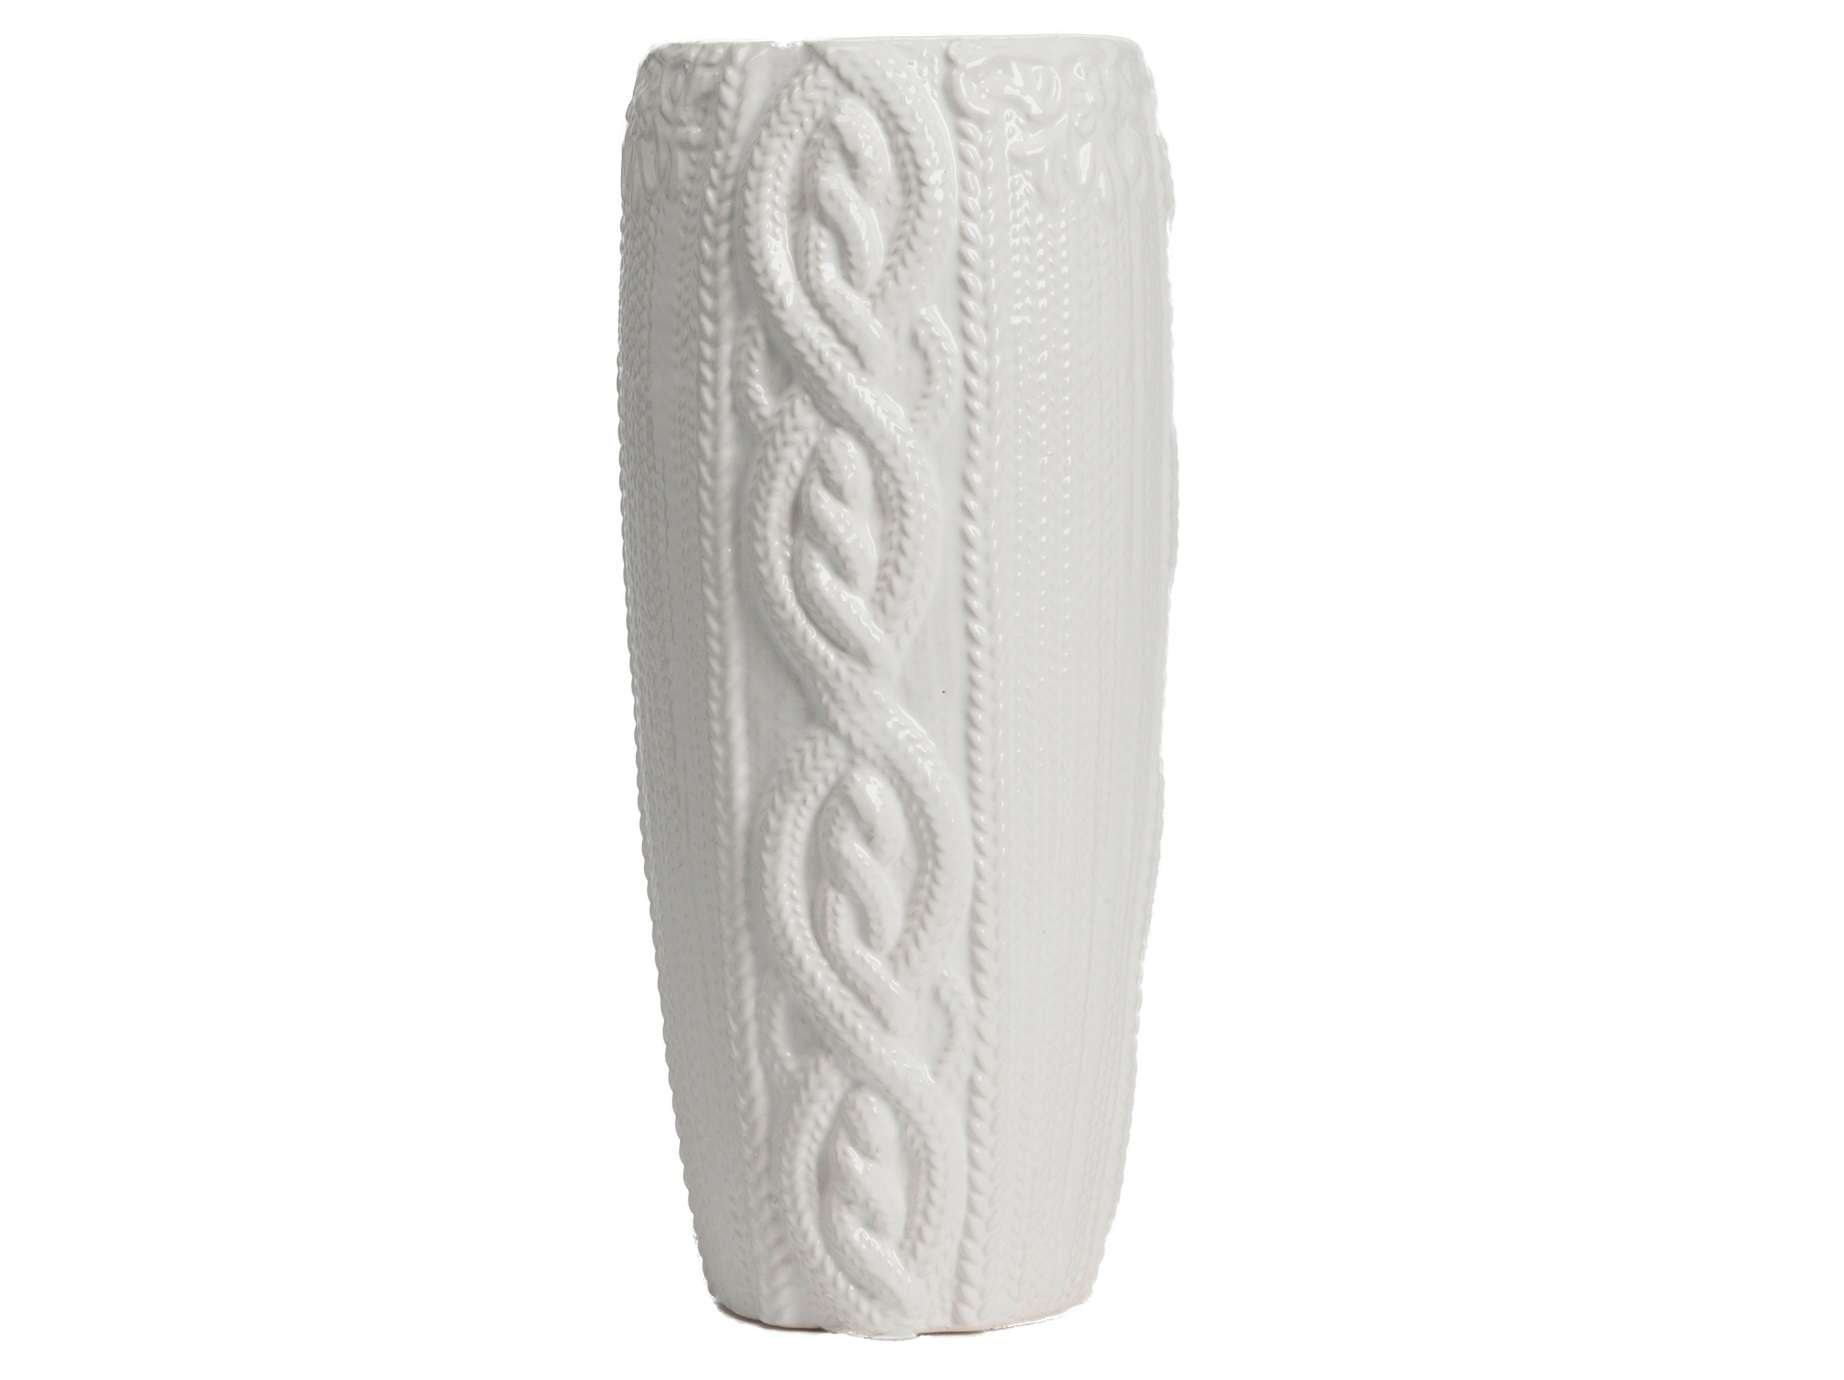 Декоративная ваза LindleyВазы<br><br><br>Material: Керамика<br>Length см: None<br>Width см: None<br>Height см: 29<br>Diameter см: 11,5